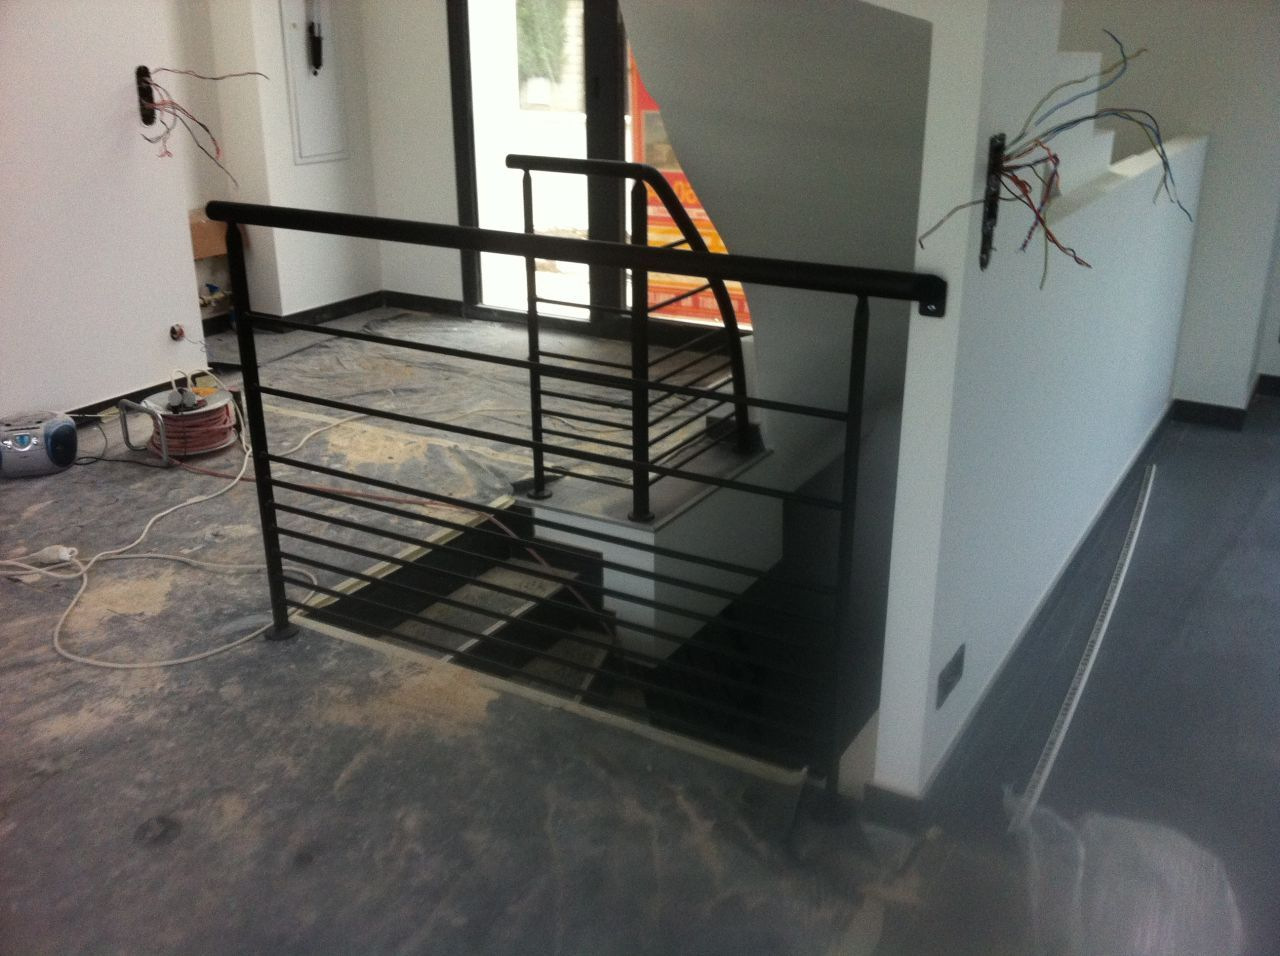 garde corps escalier escalier beton pinterest garde. Black Bedroom Furniture Sets. Home Design Ideas